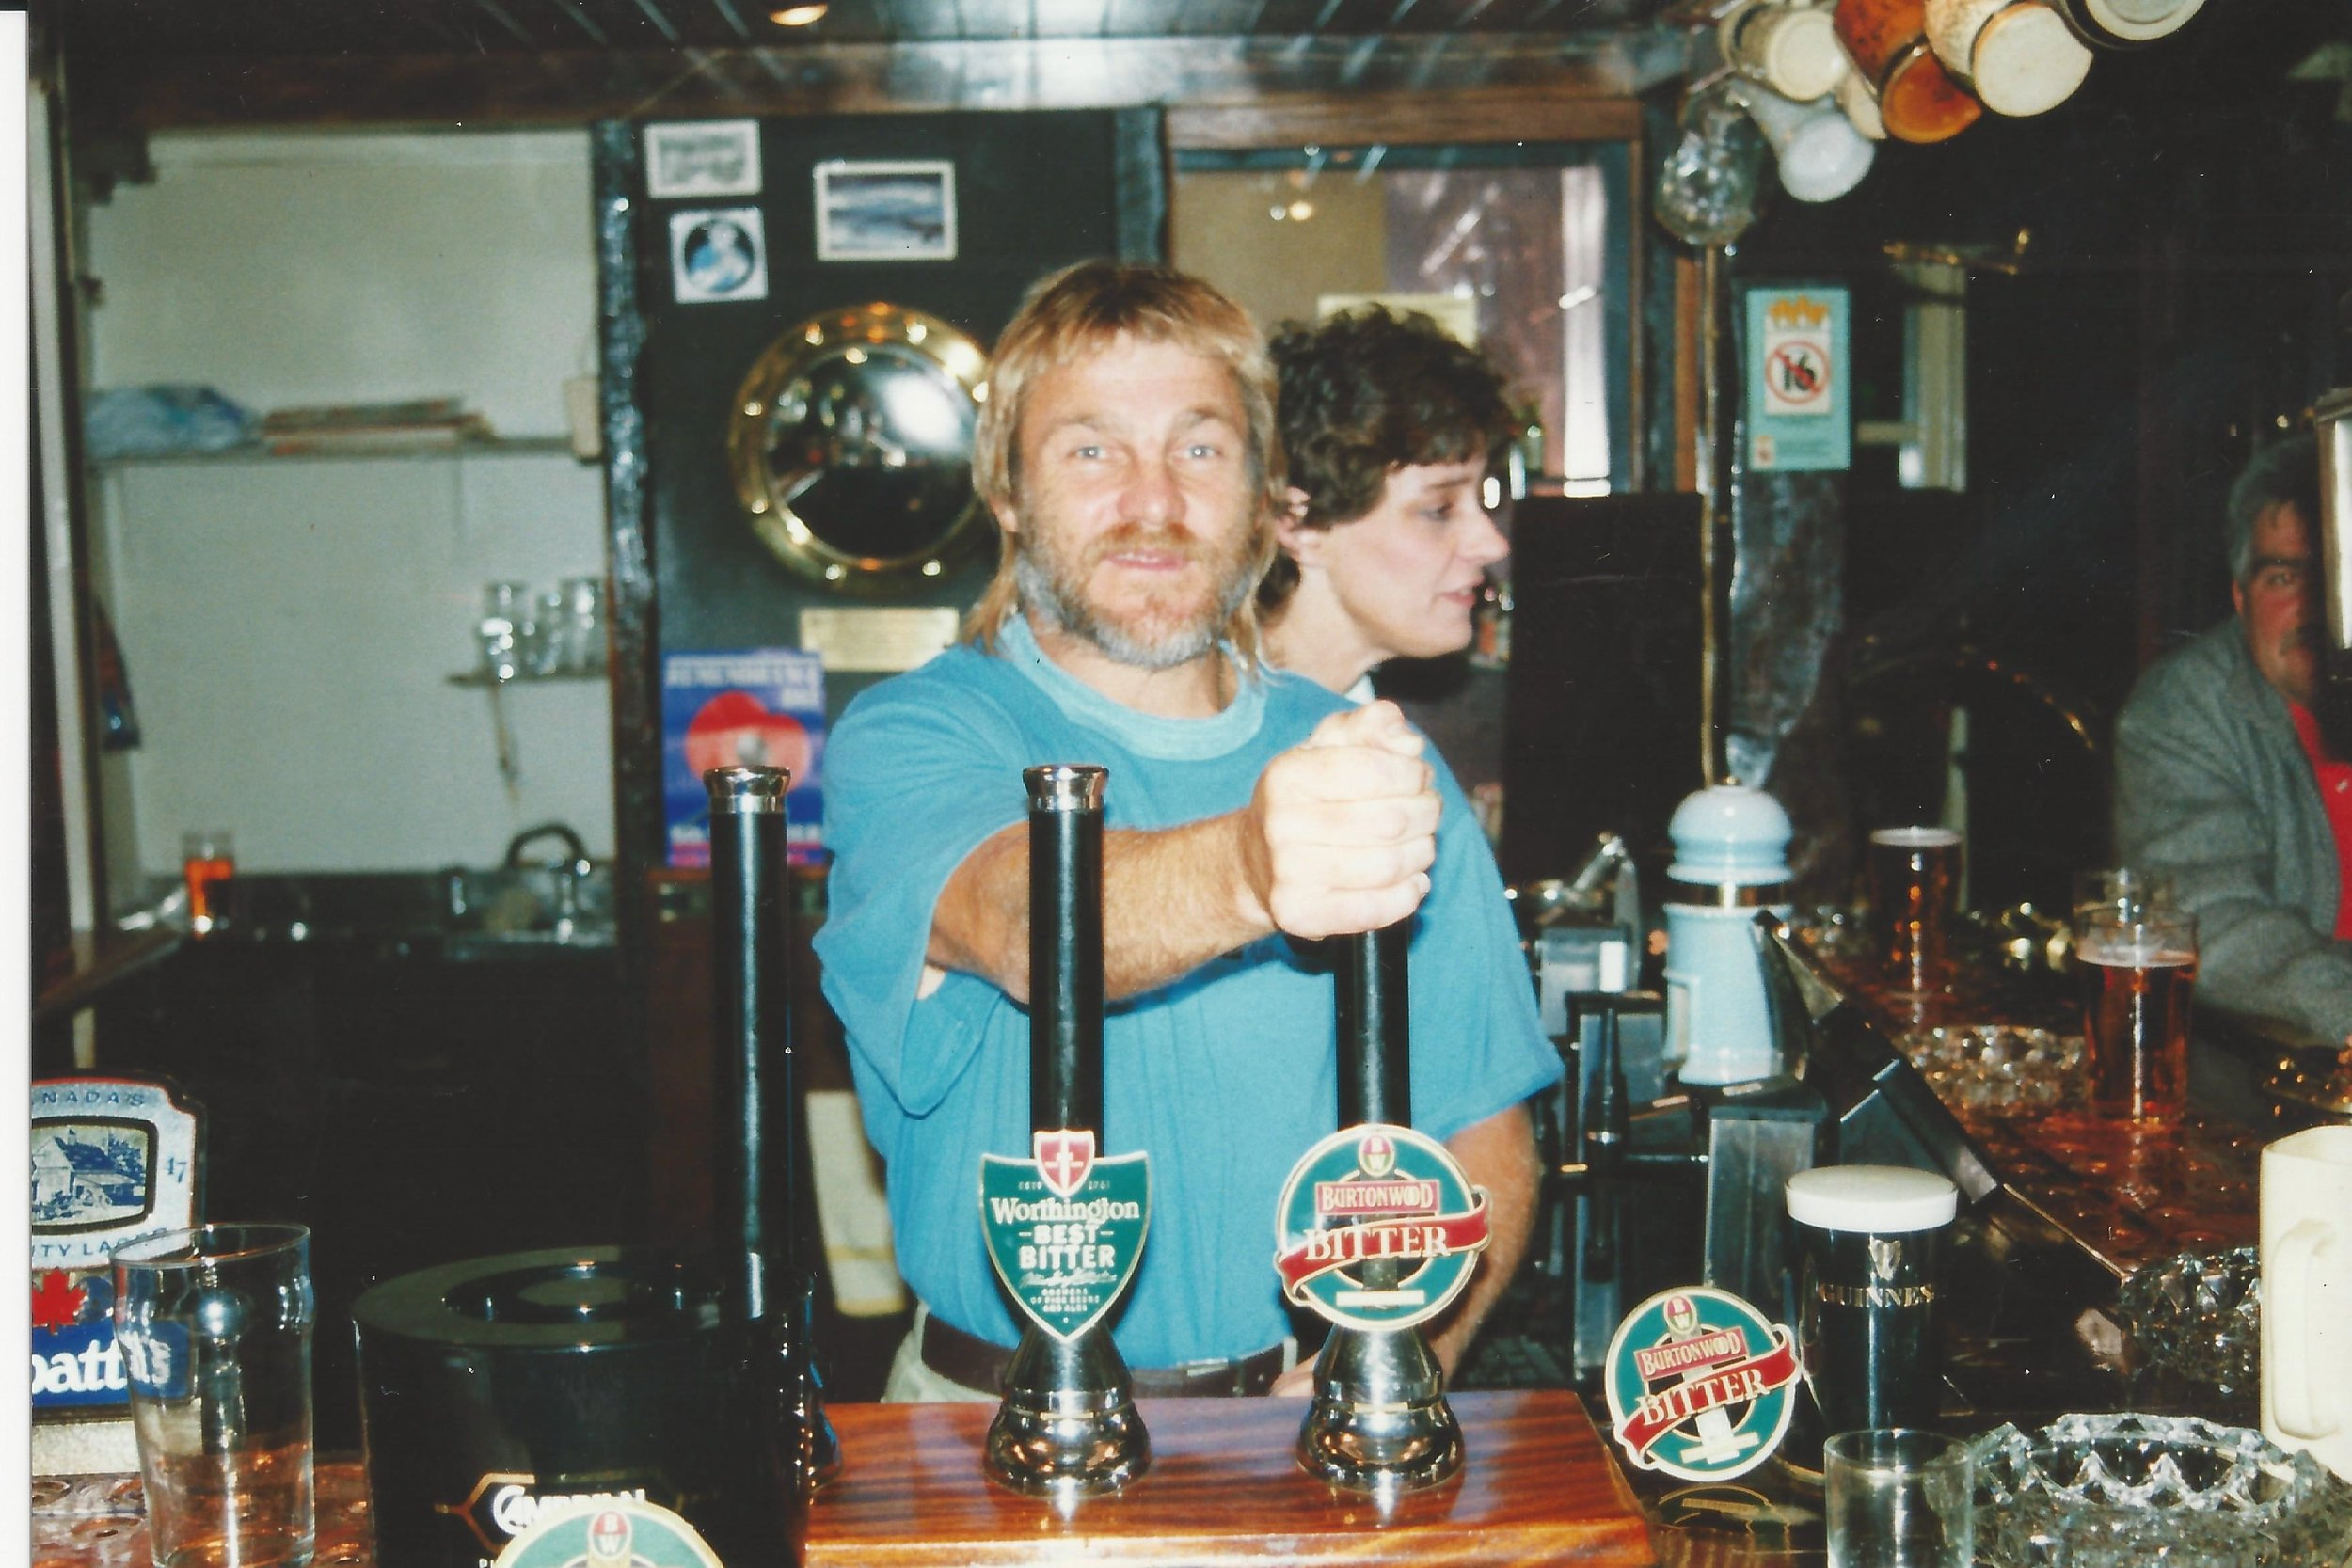 burtonwood on tap wales 92.jpg